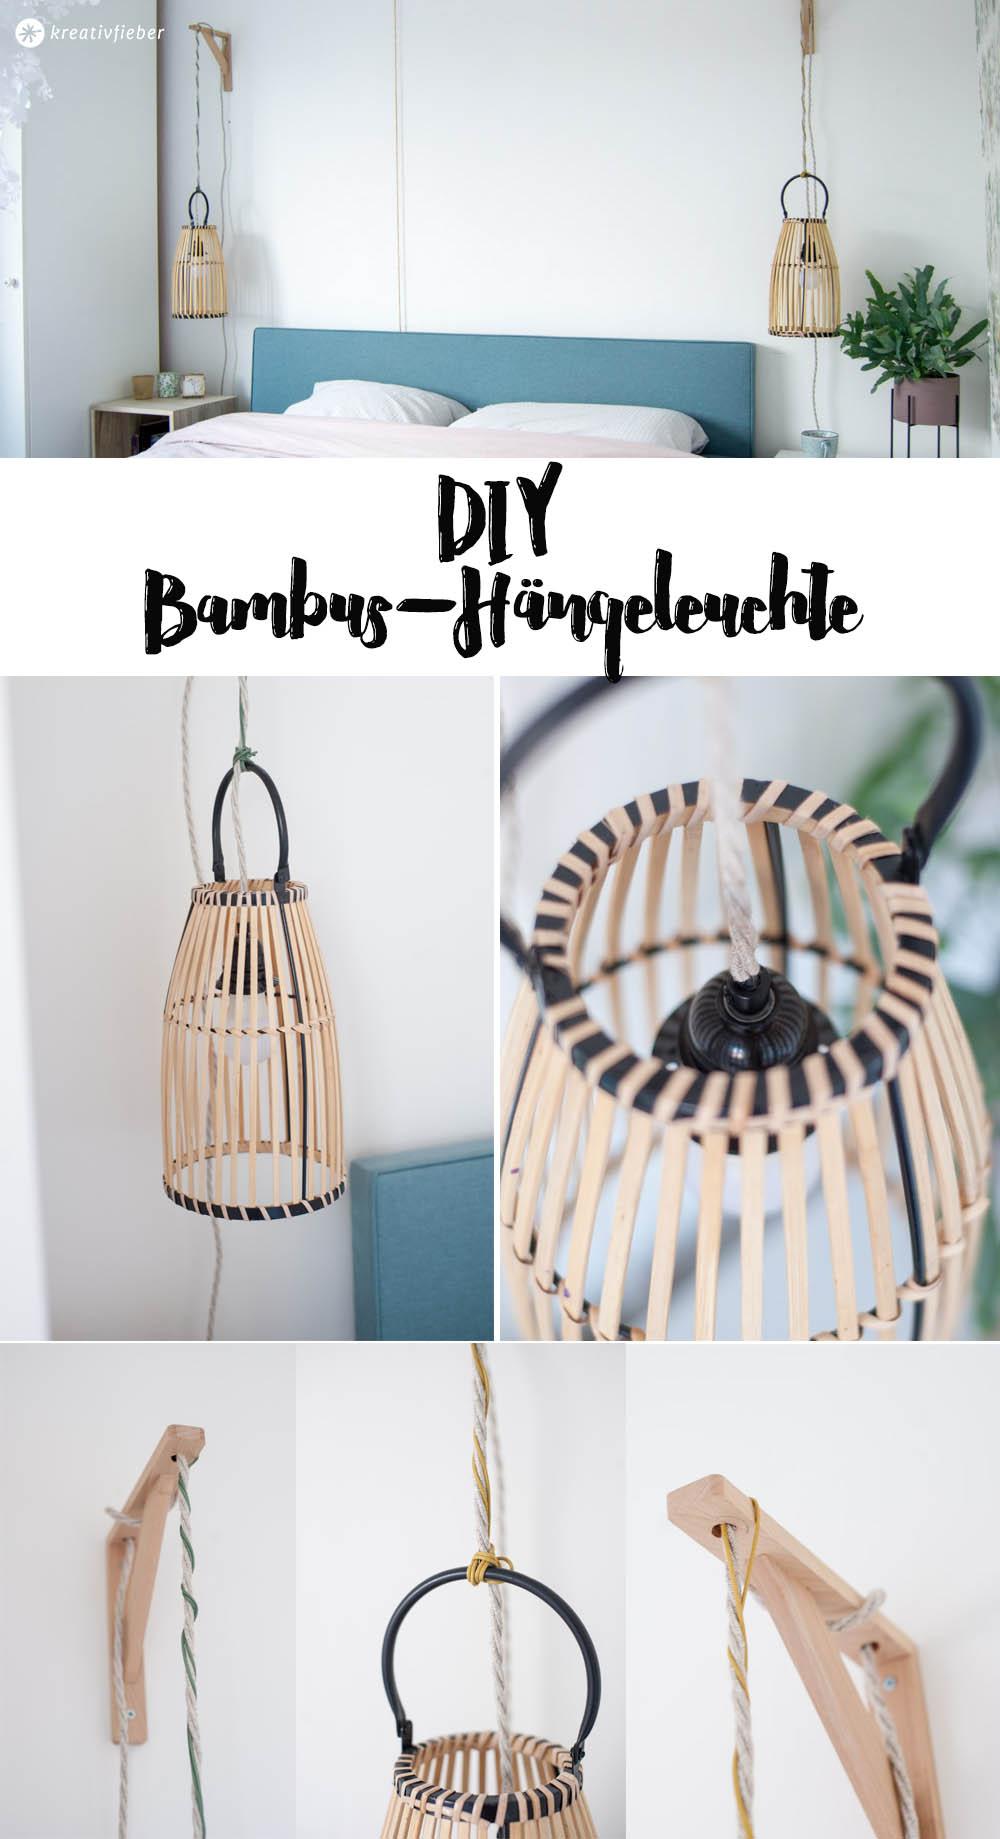 DIY Upcycling Hängeleuchten aus Bambuslaternen